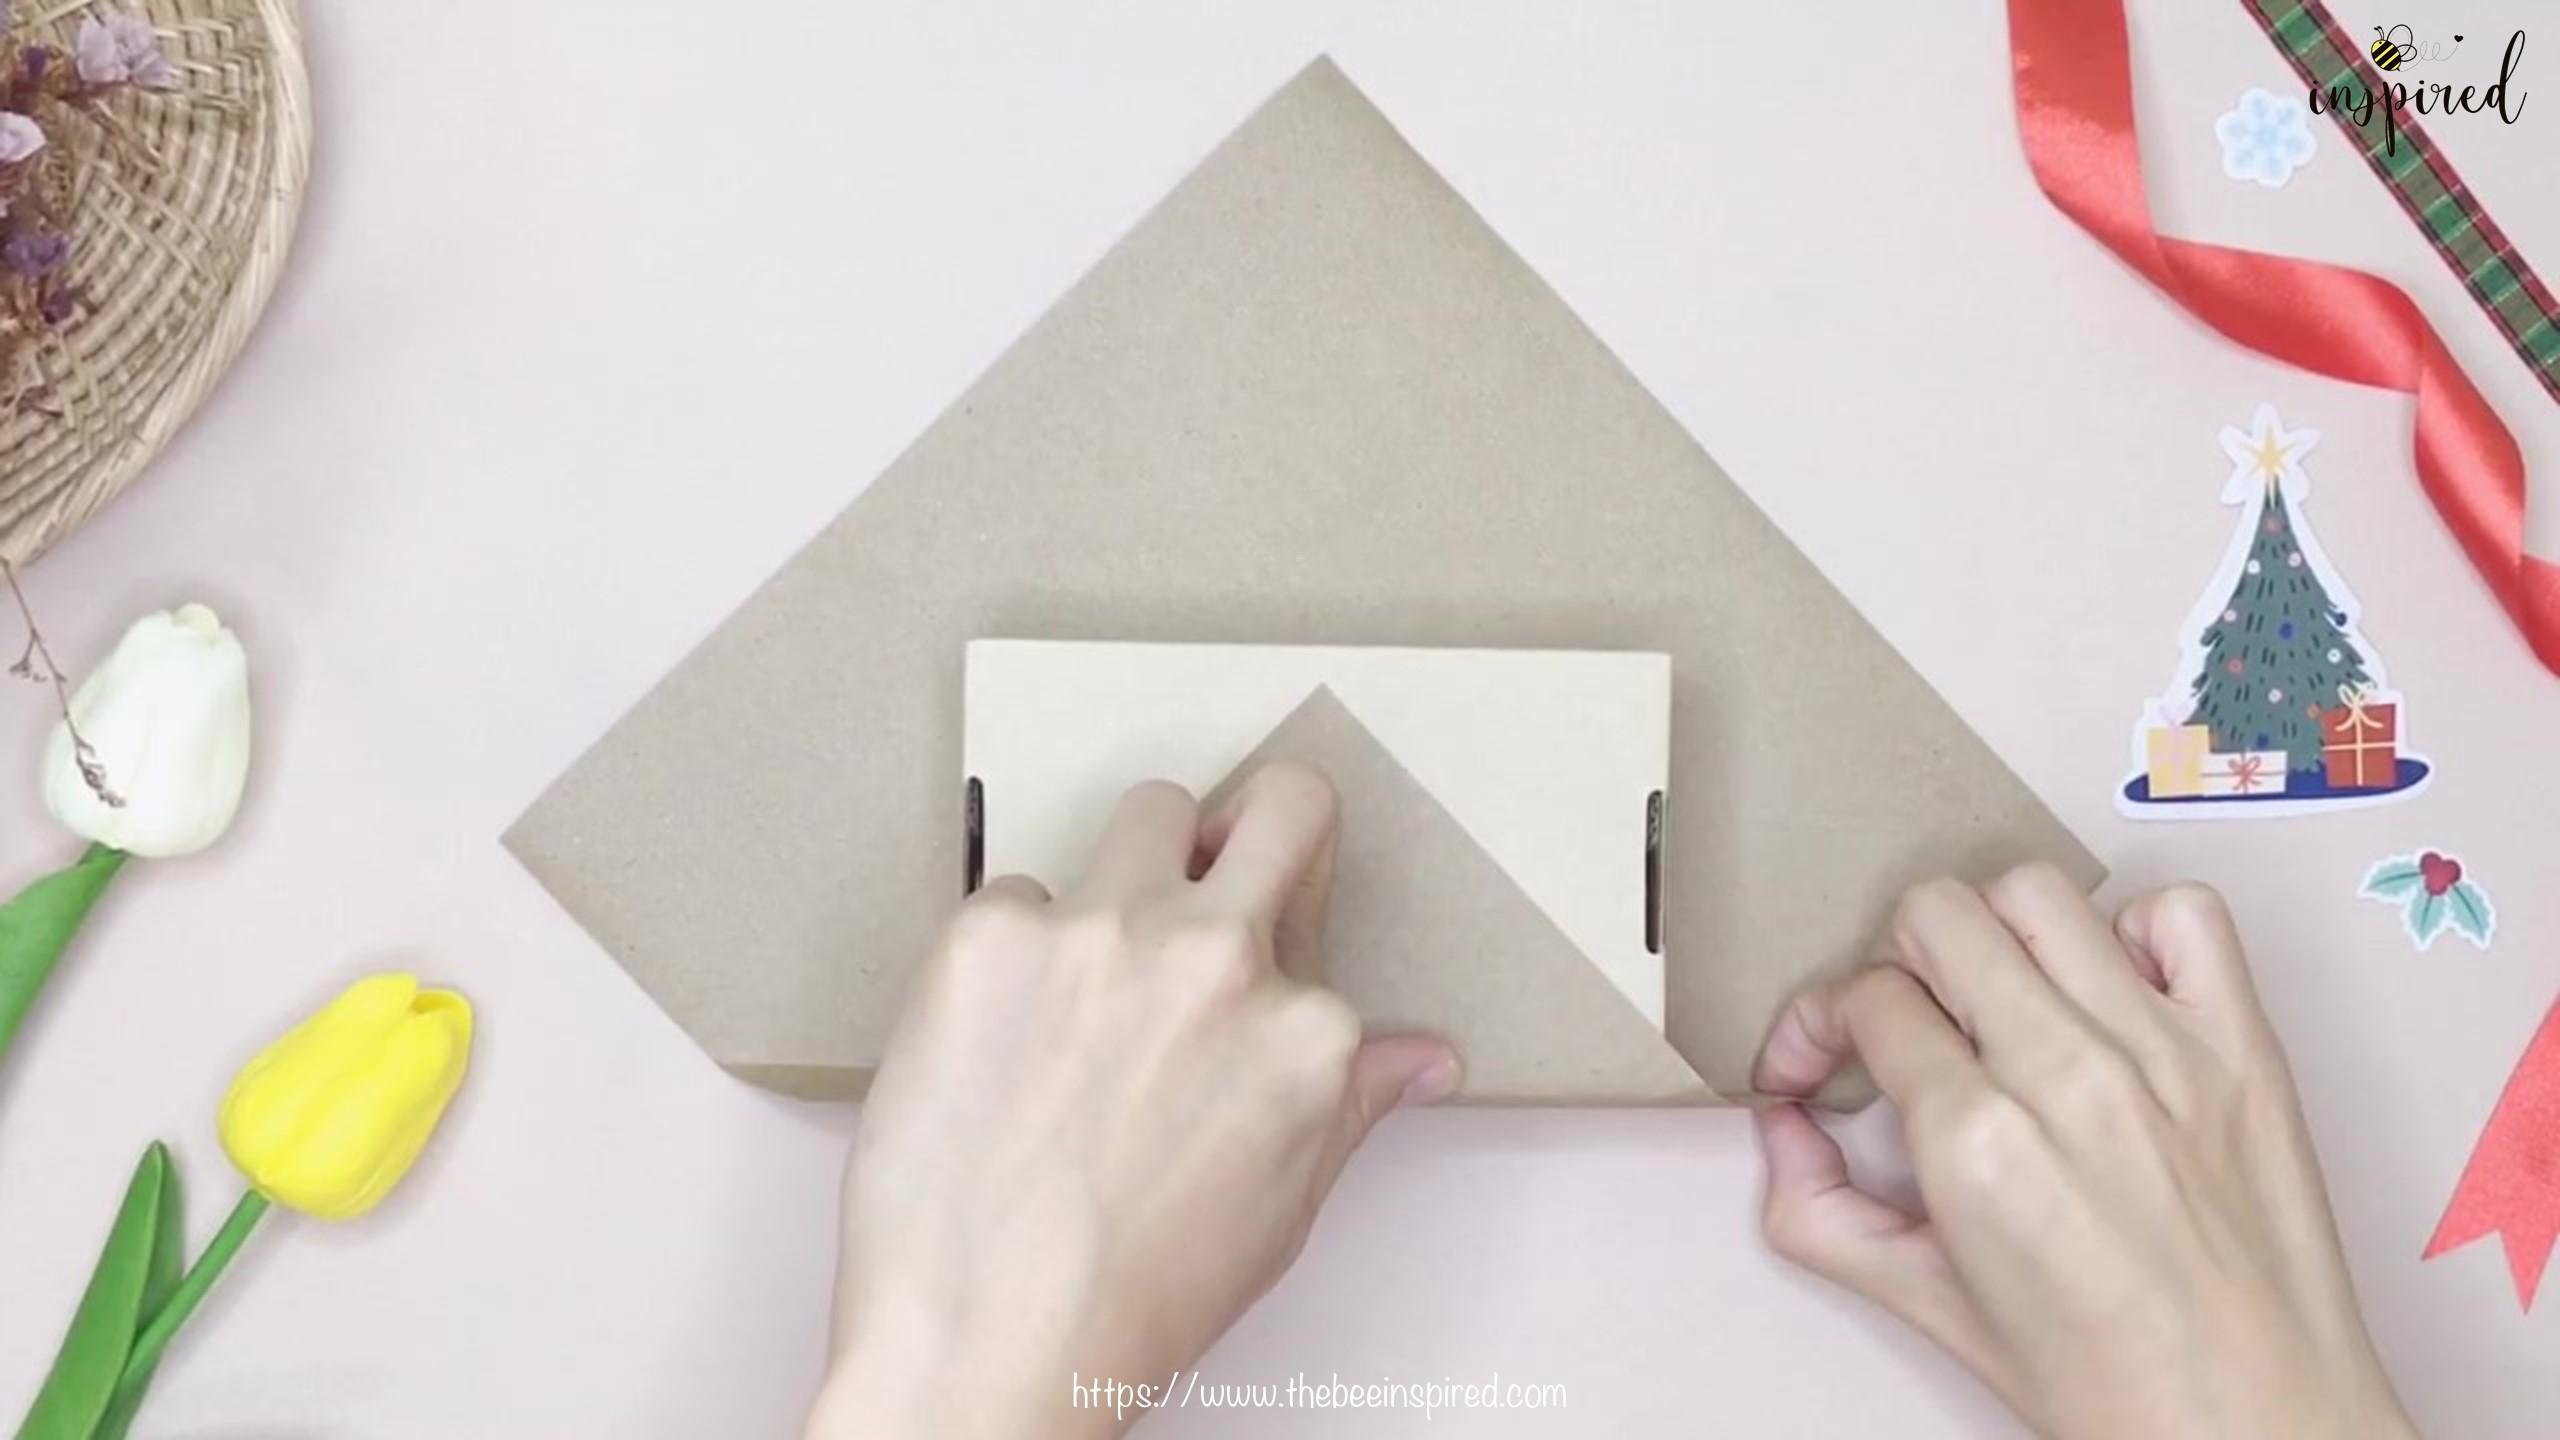 DIY วิธีห่อของขวัญวันวาเลนไทน์ วันปีใหม่ วันคริสมาส & วันเกิด แบบประหยัดกระดาษ_ Gift Wrapping Hack_5